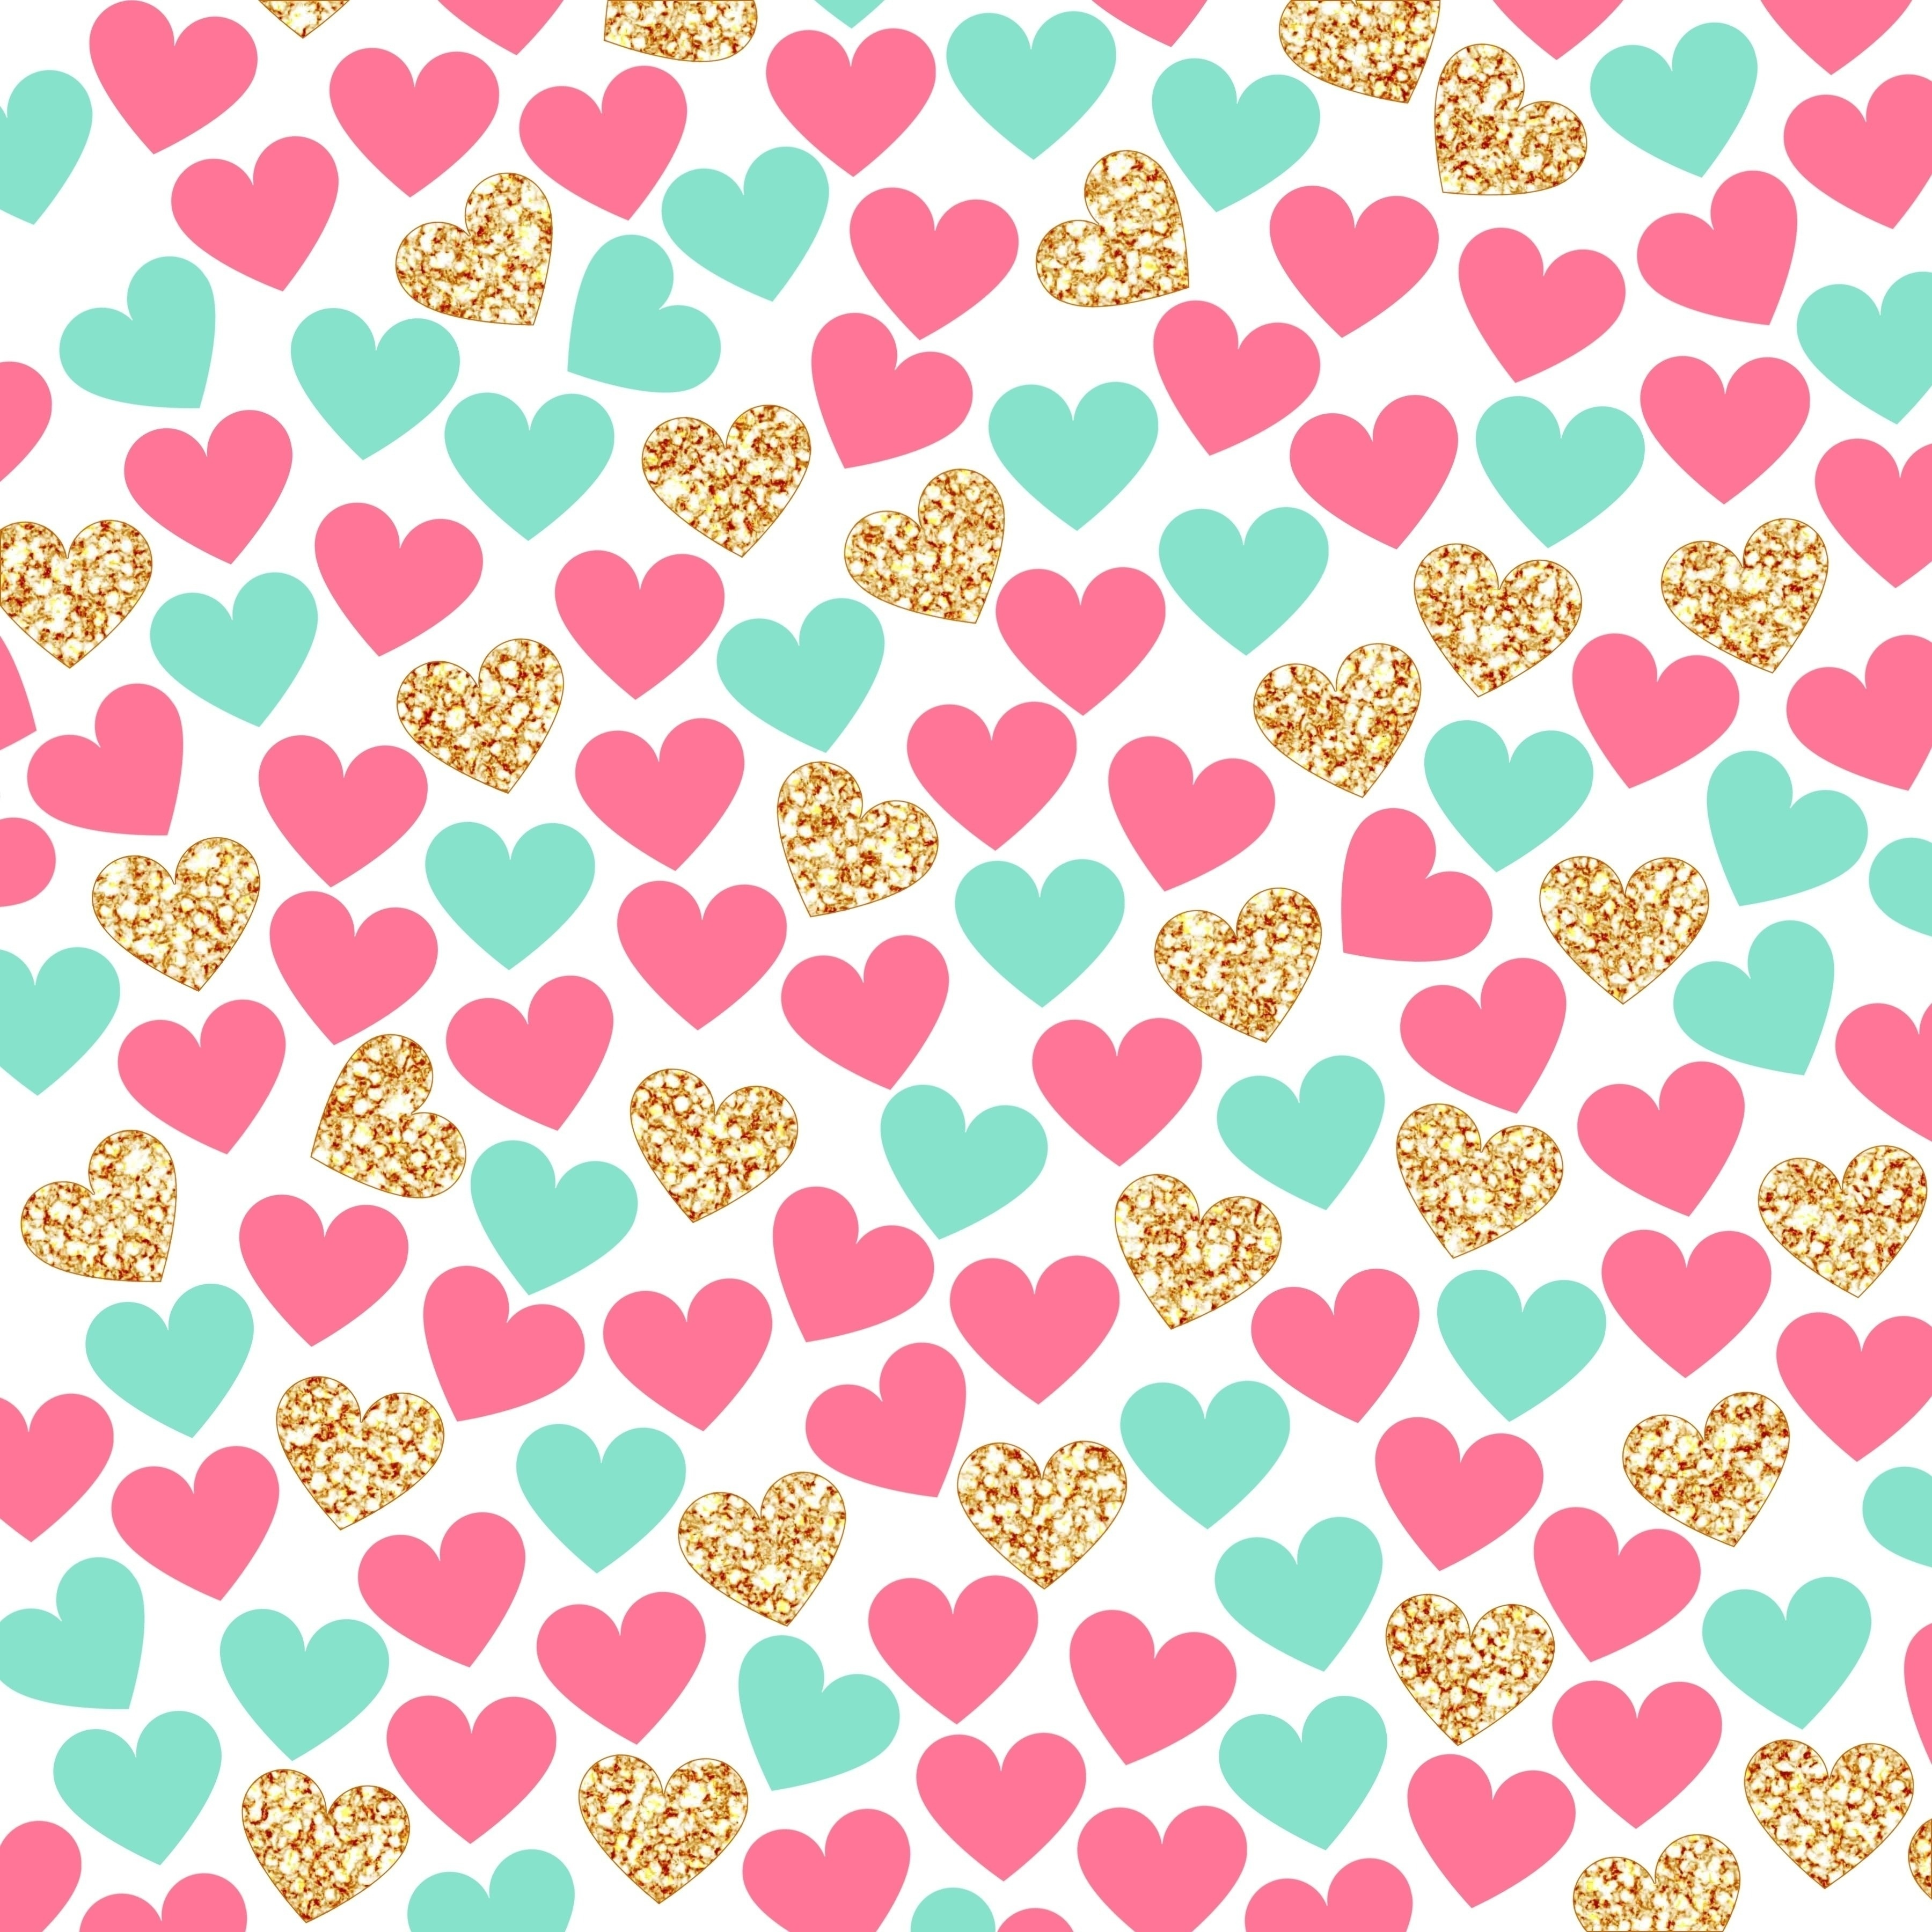 Free Printable Scrapbook Paper Designs Pink | Happyeasterfrom With - Free Printable Scrapbook Paper Designs